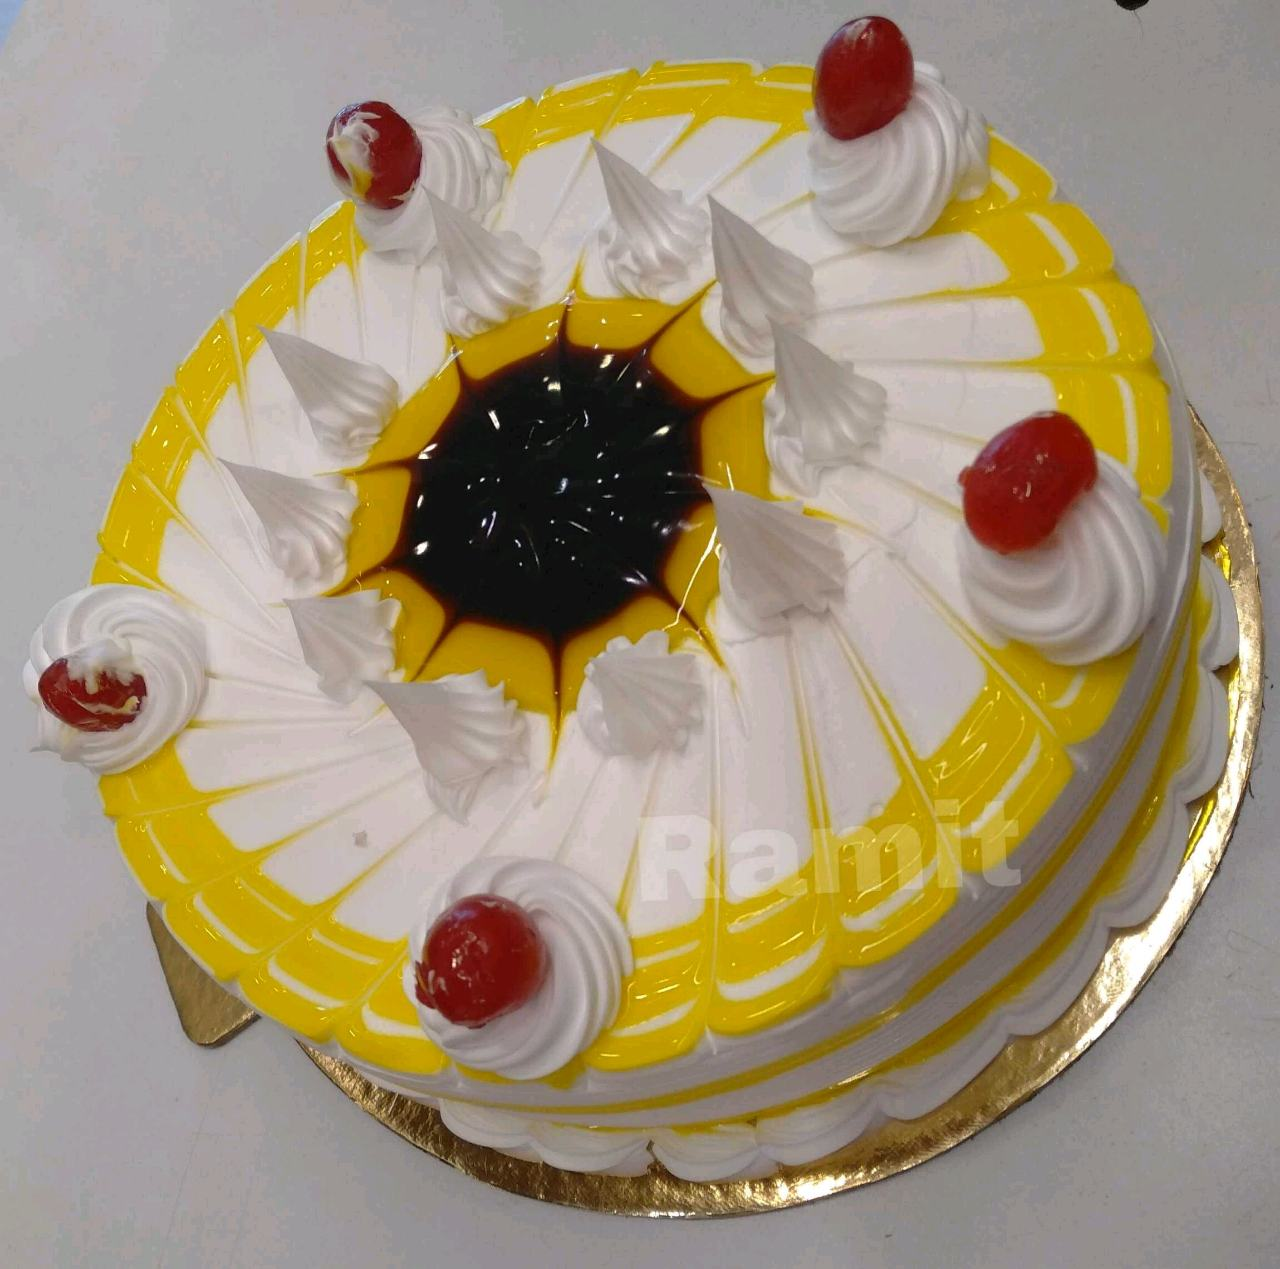 Eggless Pineapple Jelly Cake